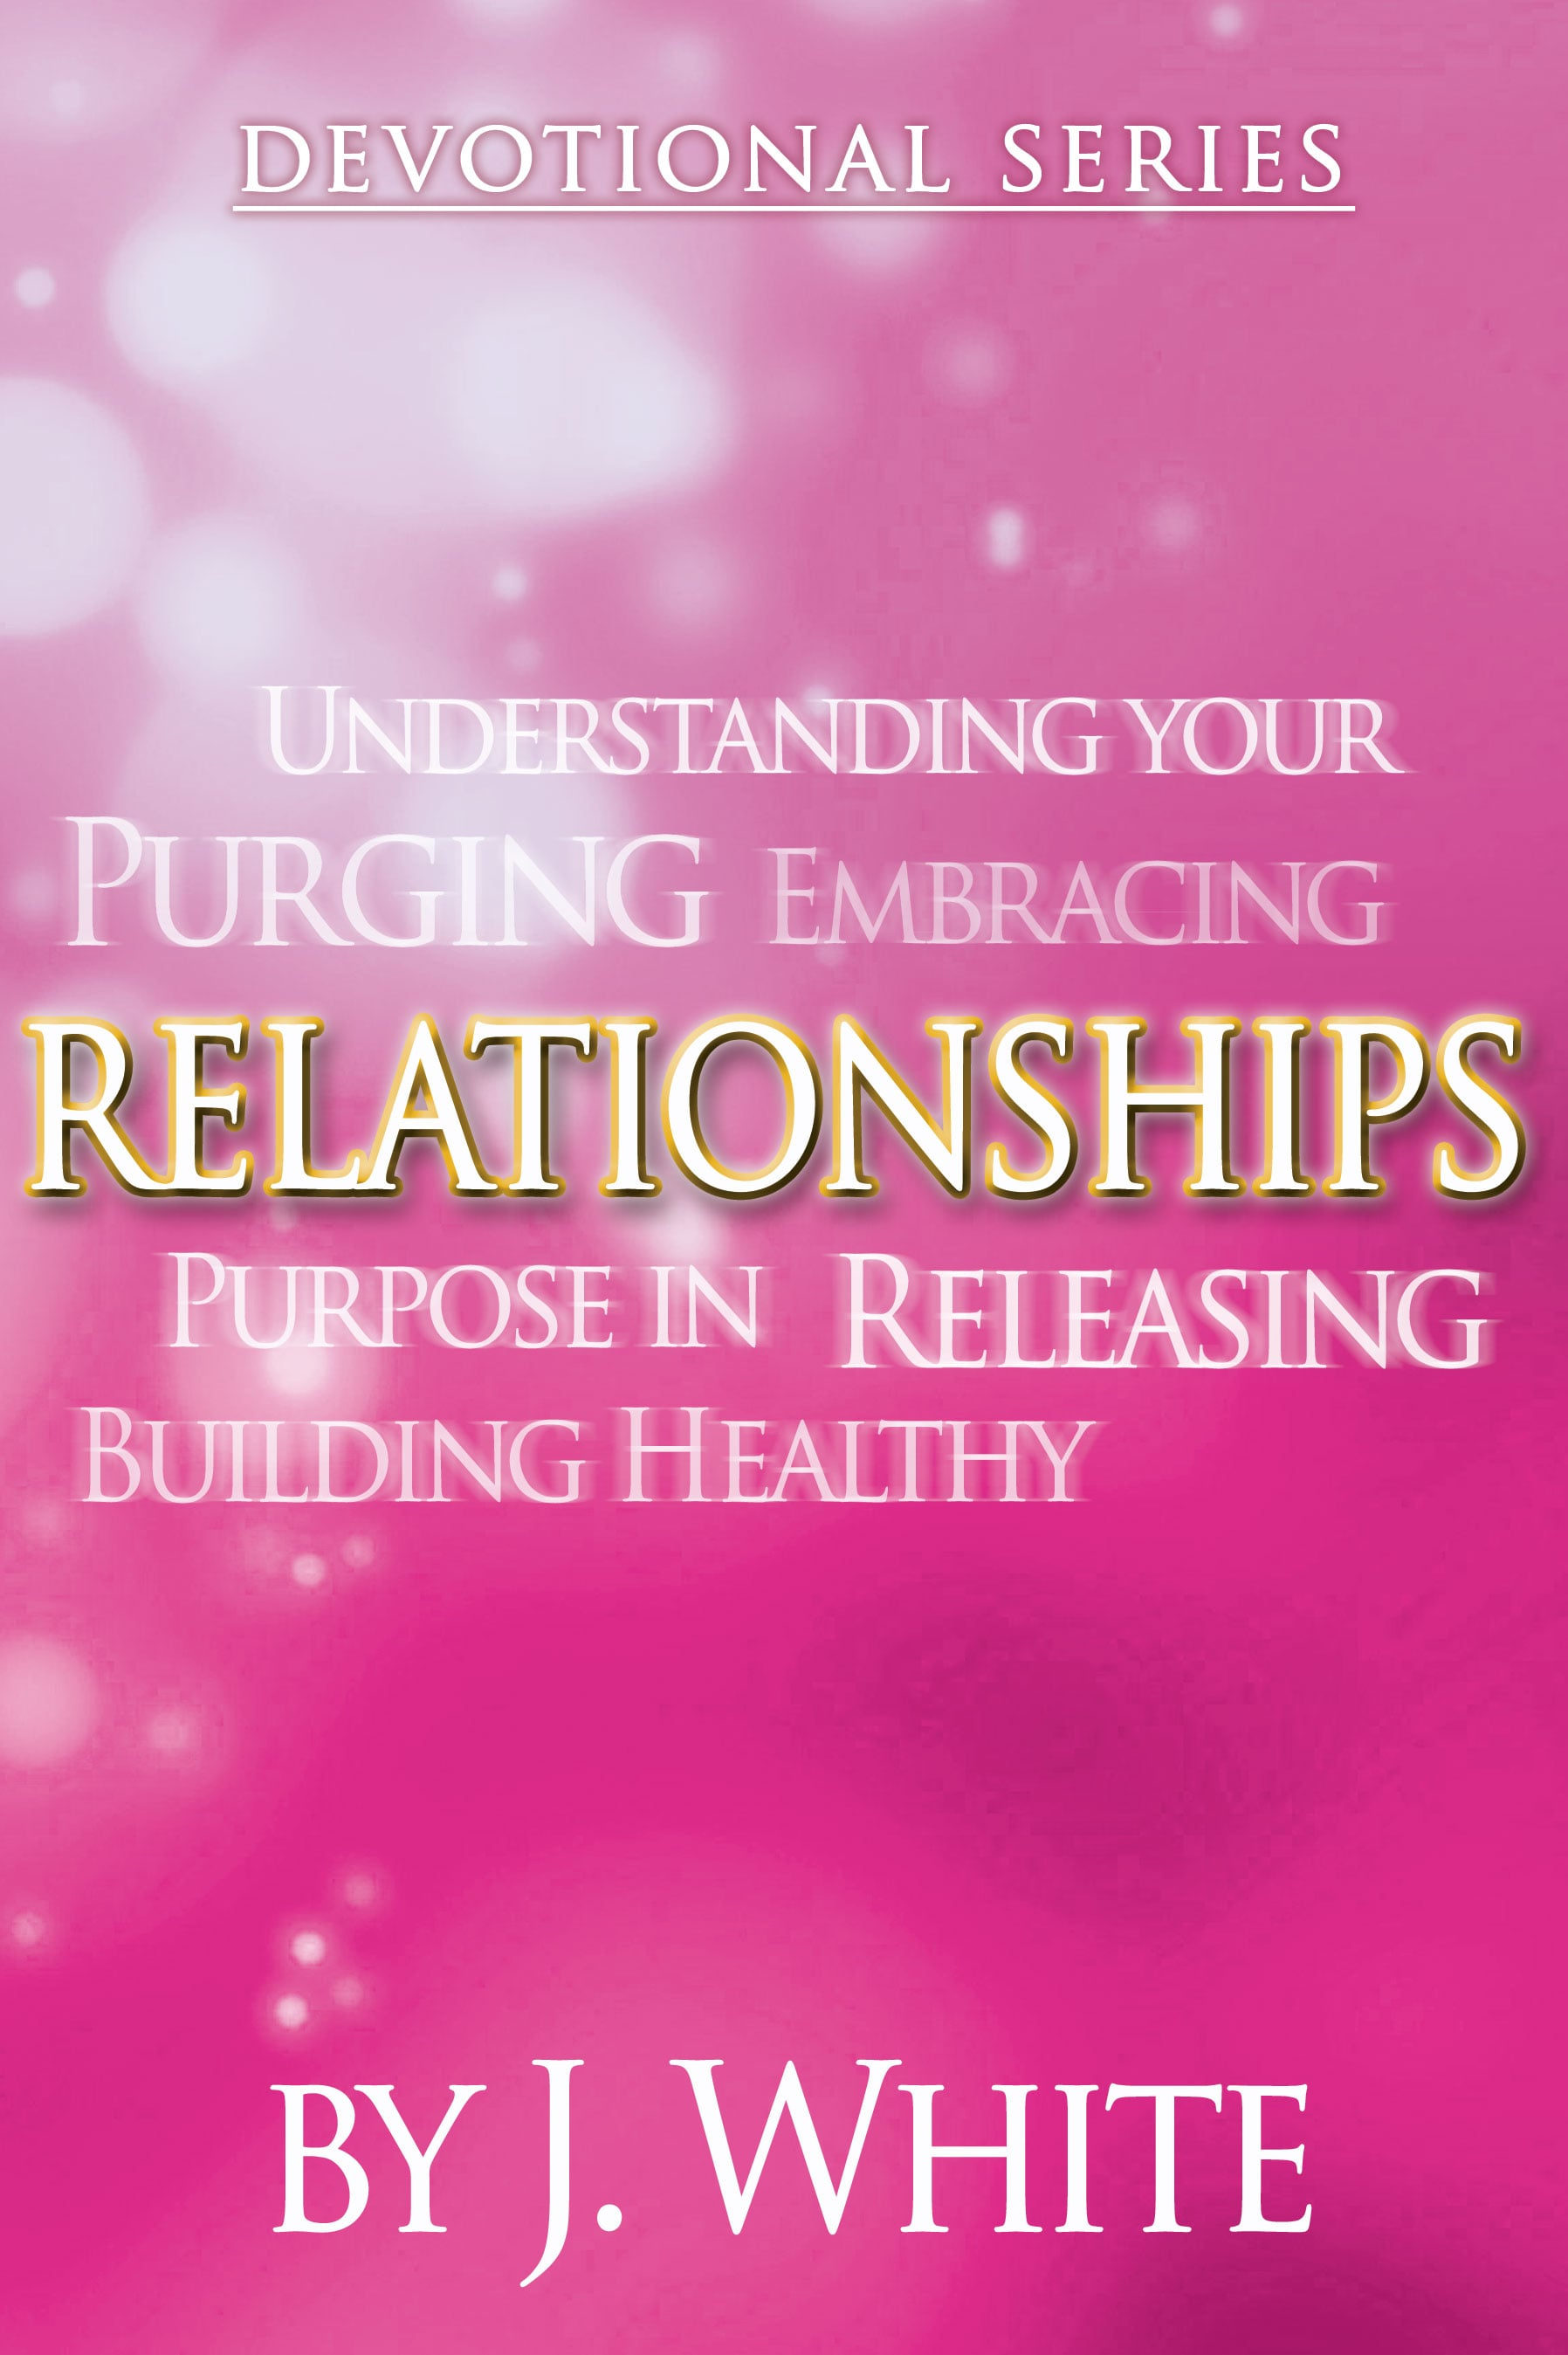 Relationships-book-cover.jpg